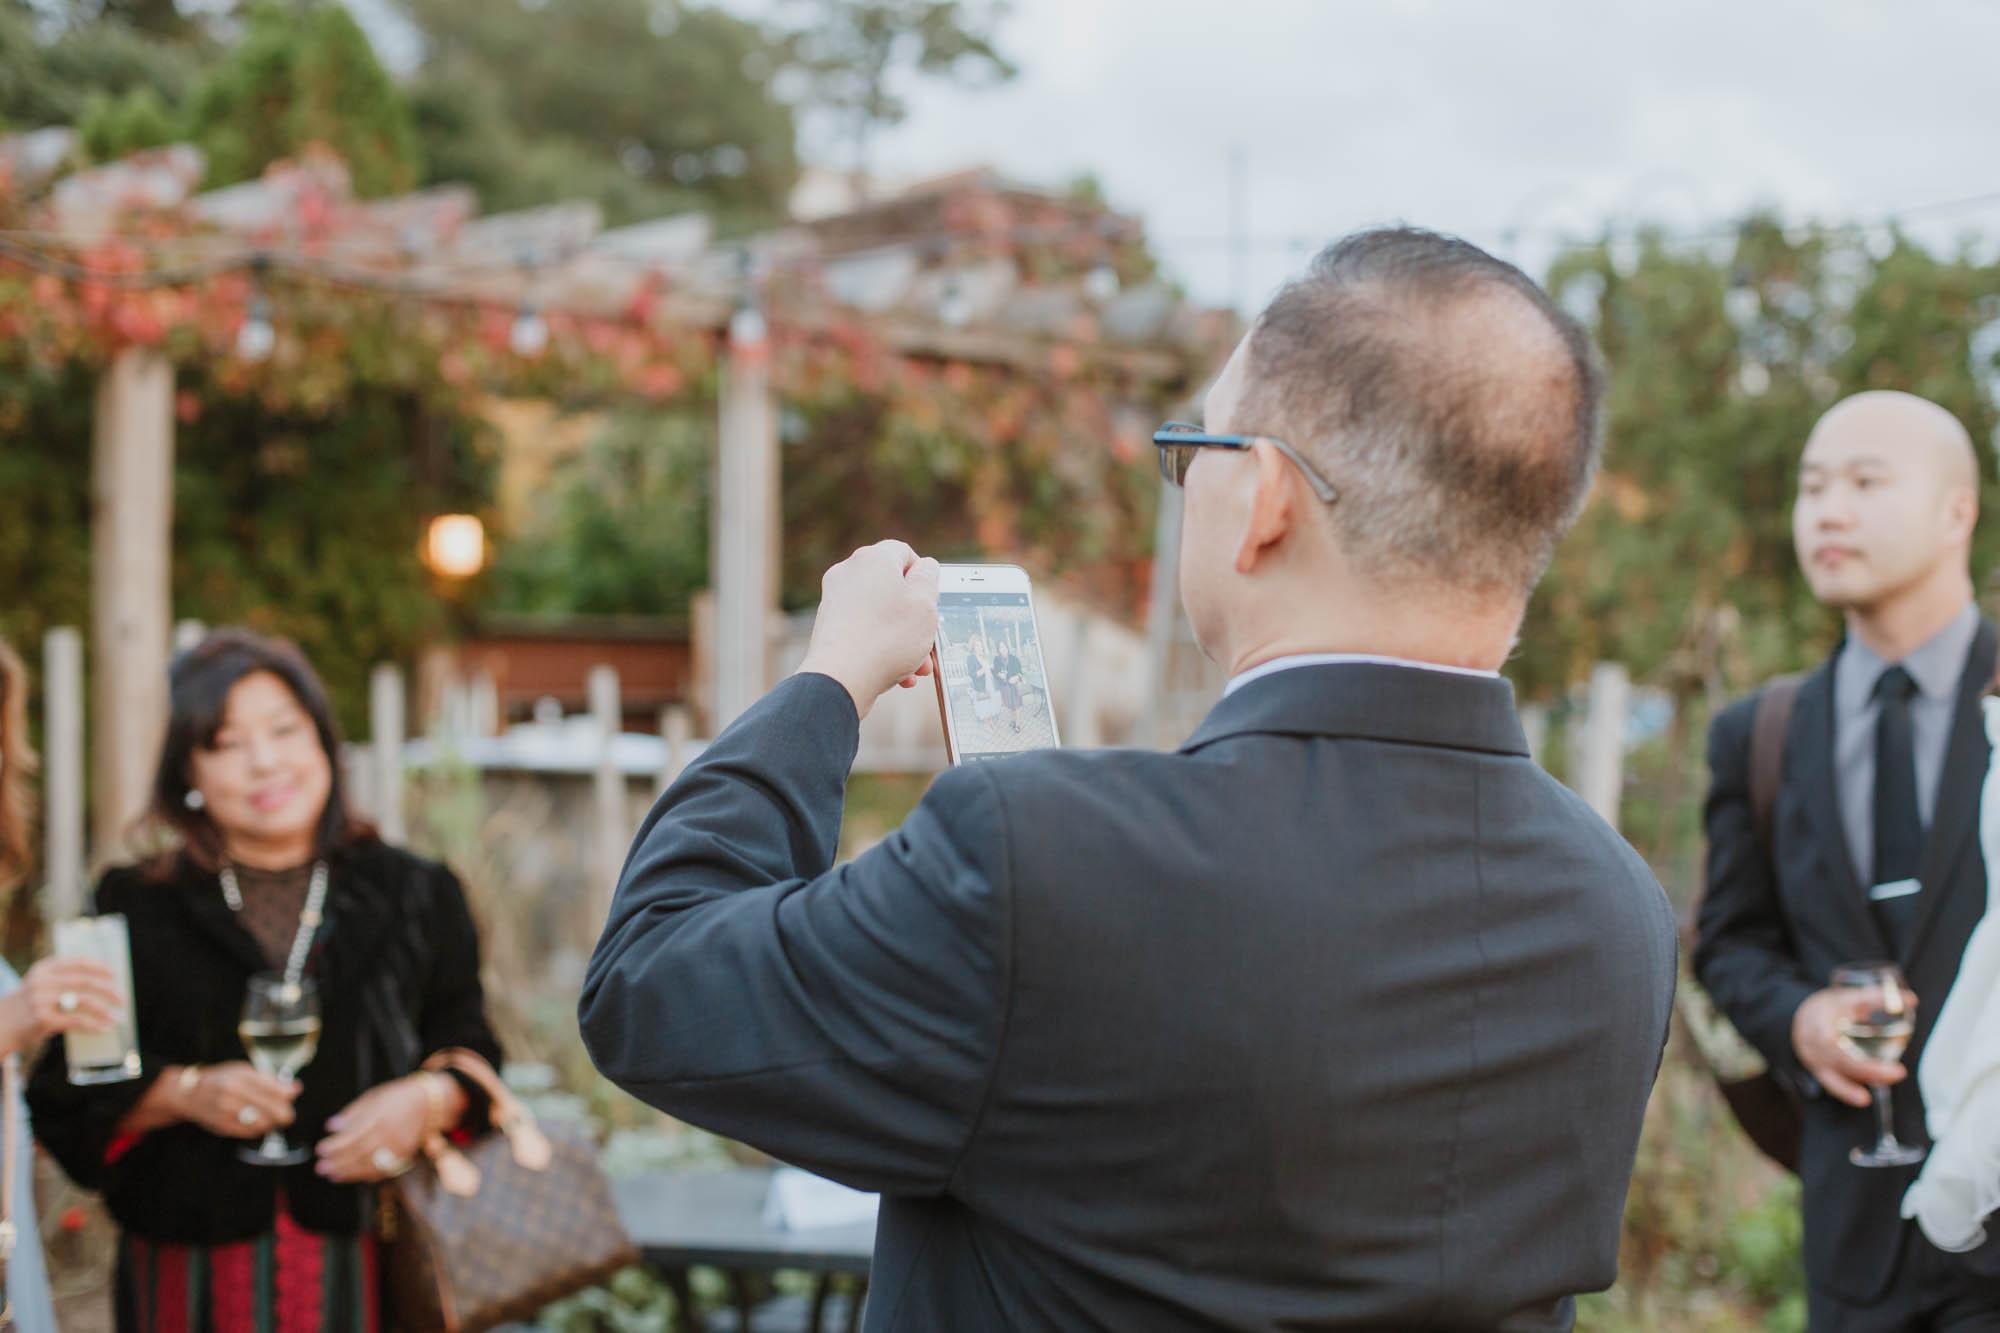 hastings-on-hudson-wedding-photographer-38.jpg